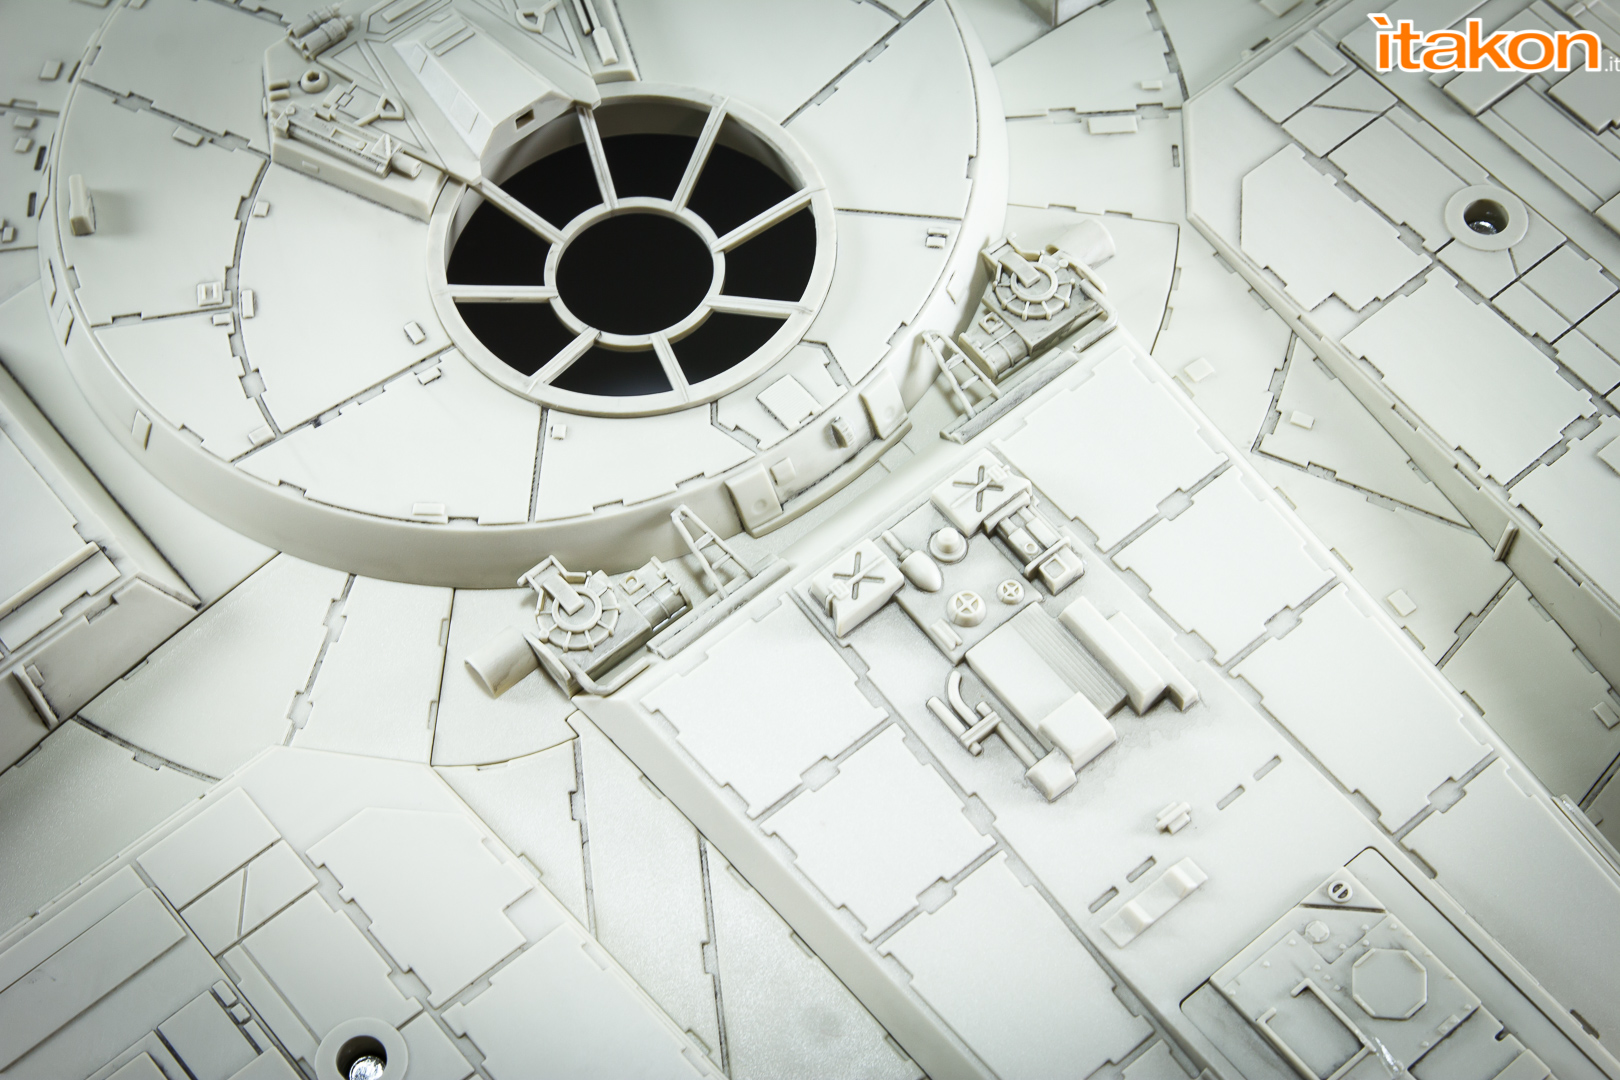 Link a Millennium Falcon DeAgostini Itakon-9